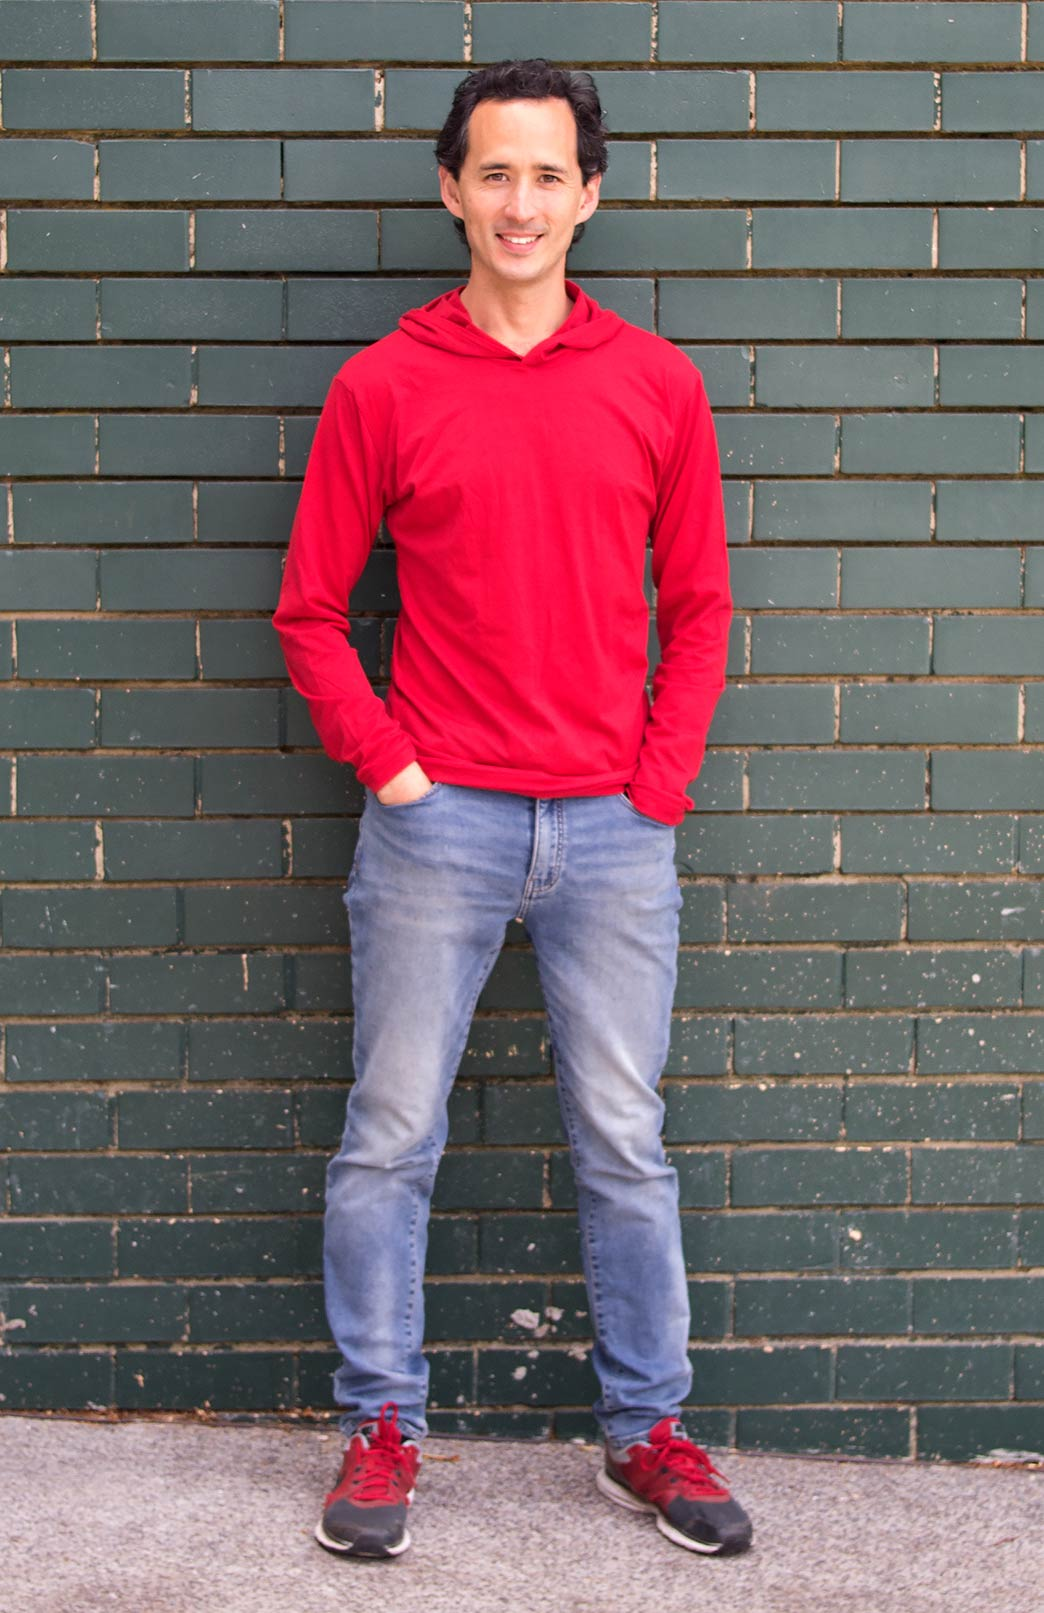 Crew Neck Hoody (~200g) - Men's Lightweight 200g Flame Red Wool Long Sleeved Crew Neck Top with hood - Smitten Merino Tasmania Australia